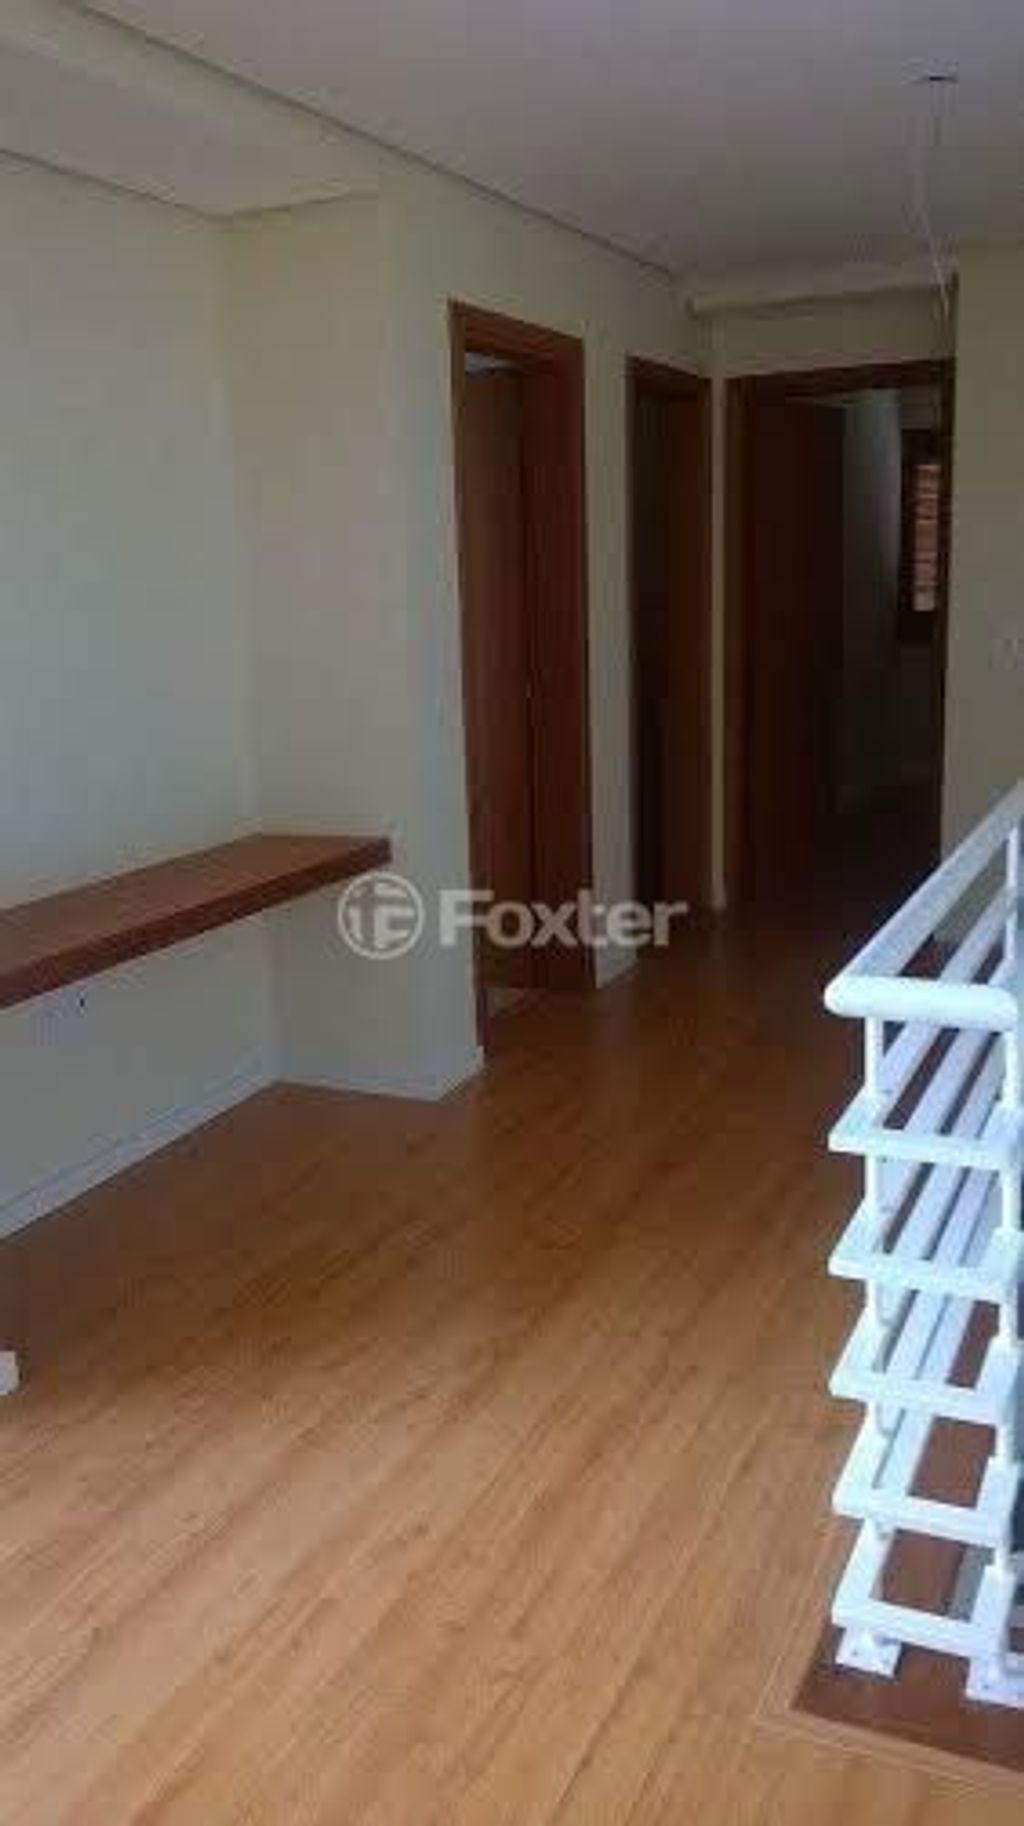 Casa 3 Dorm, Aberta dos Morros, Porto Alegre (139891) - Foto 42